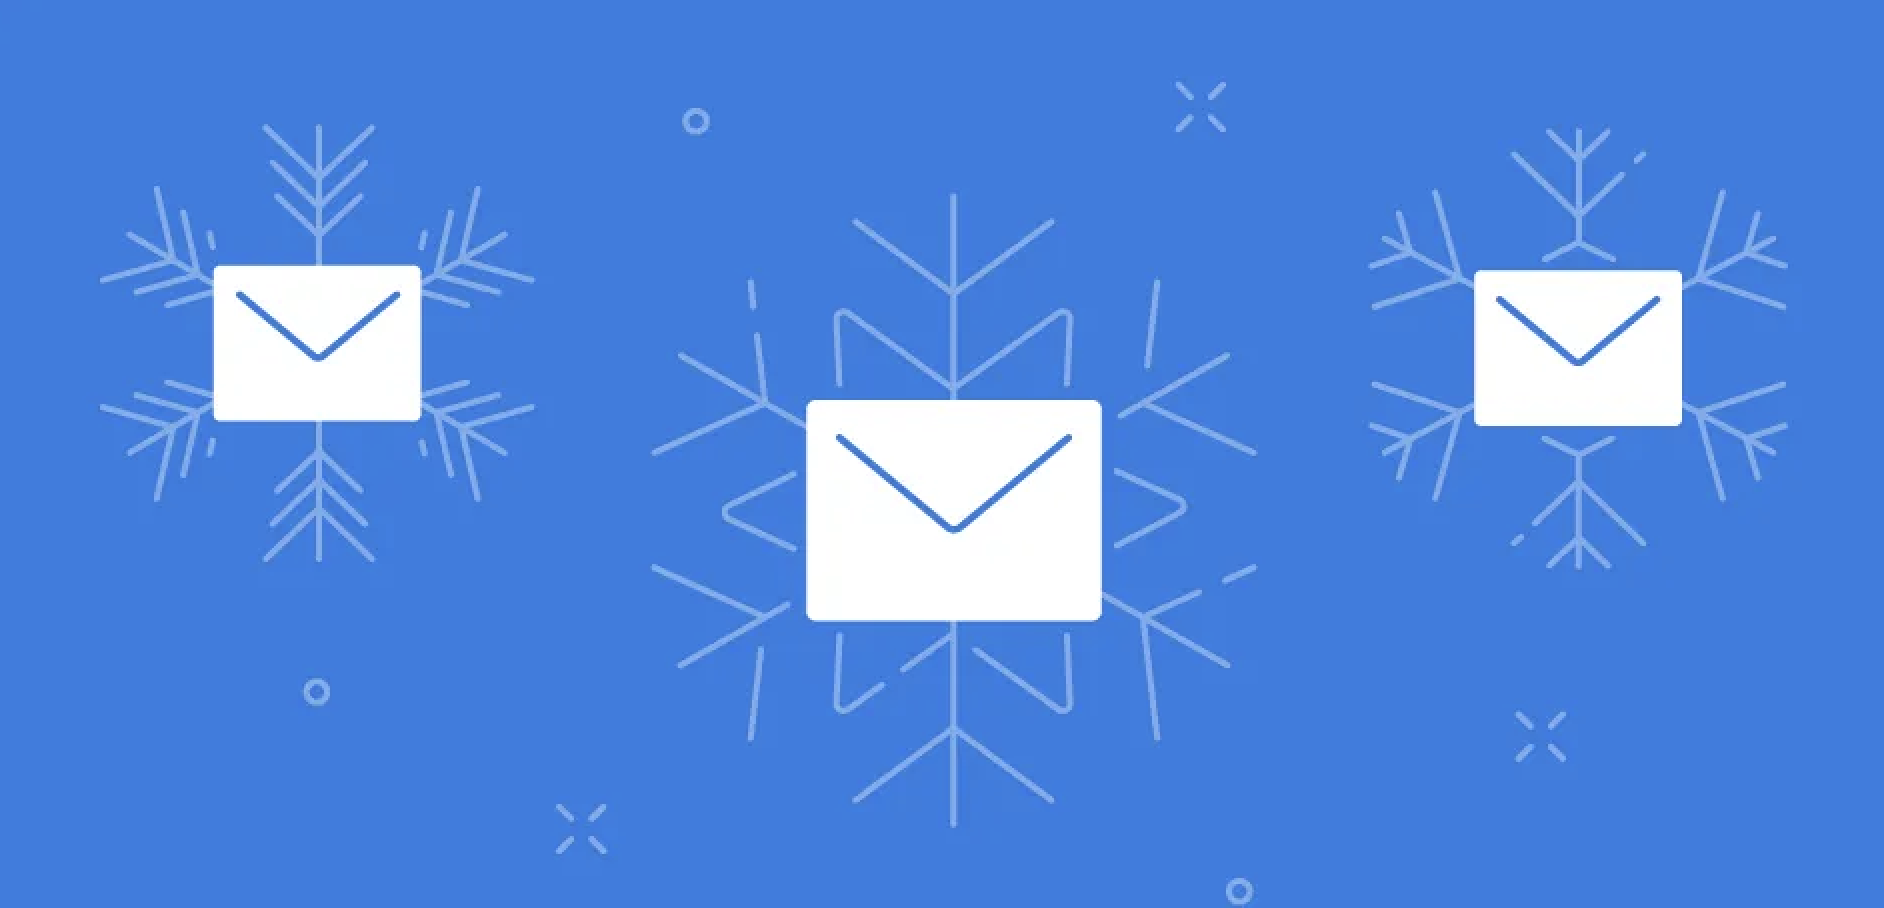 targeted emails in digital marketing